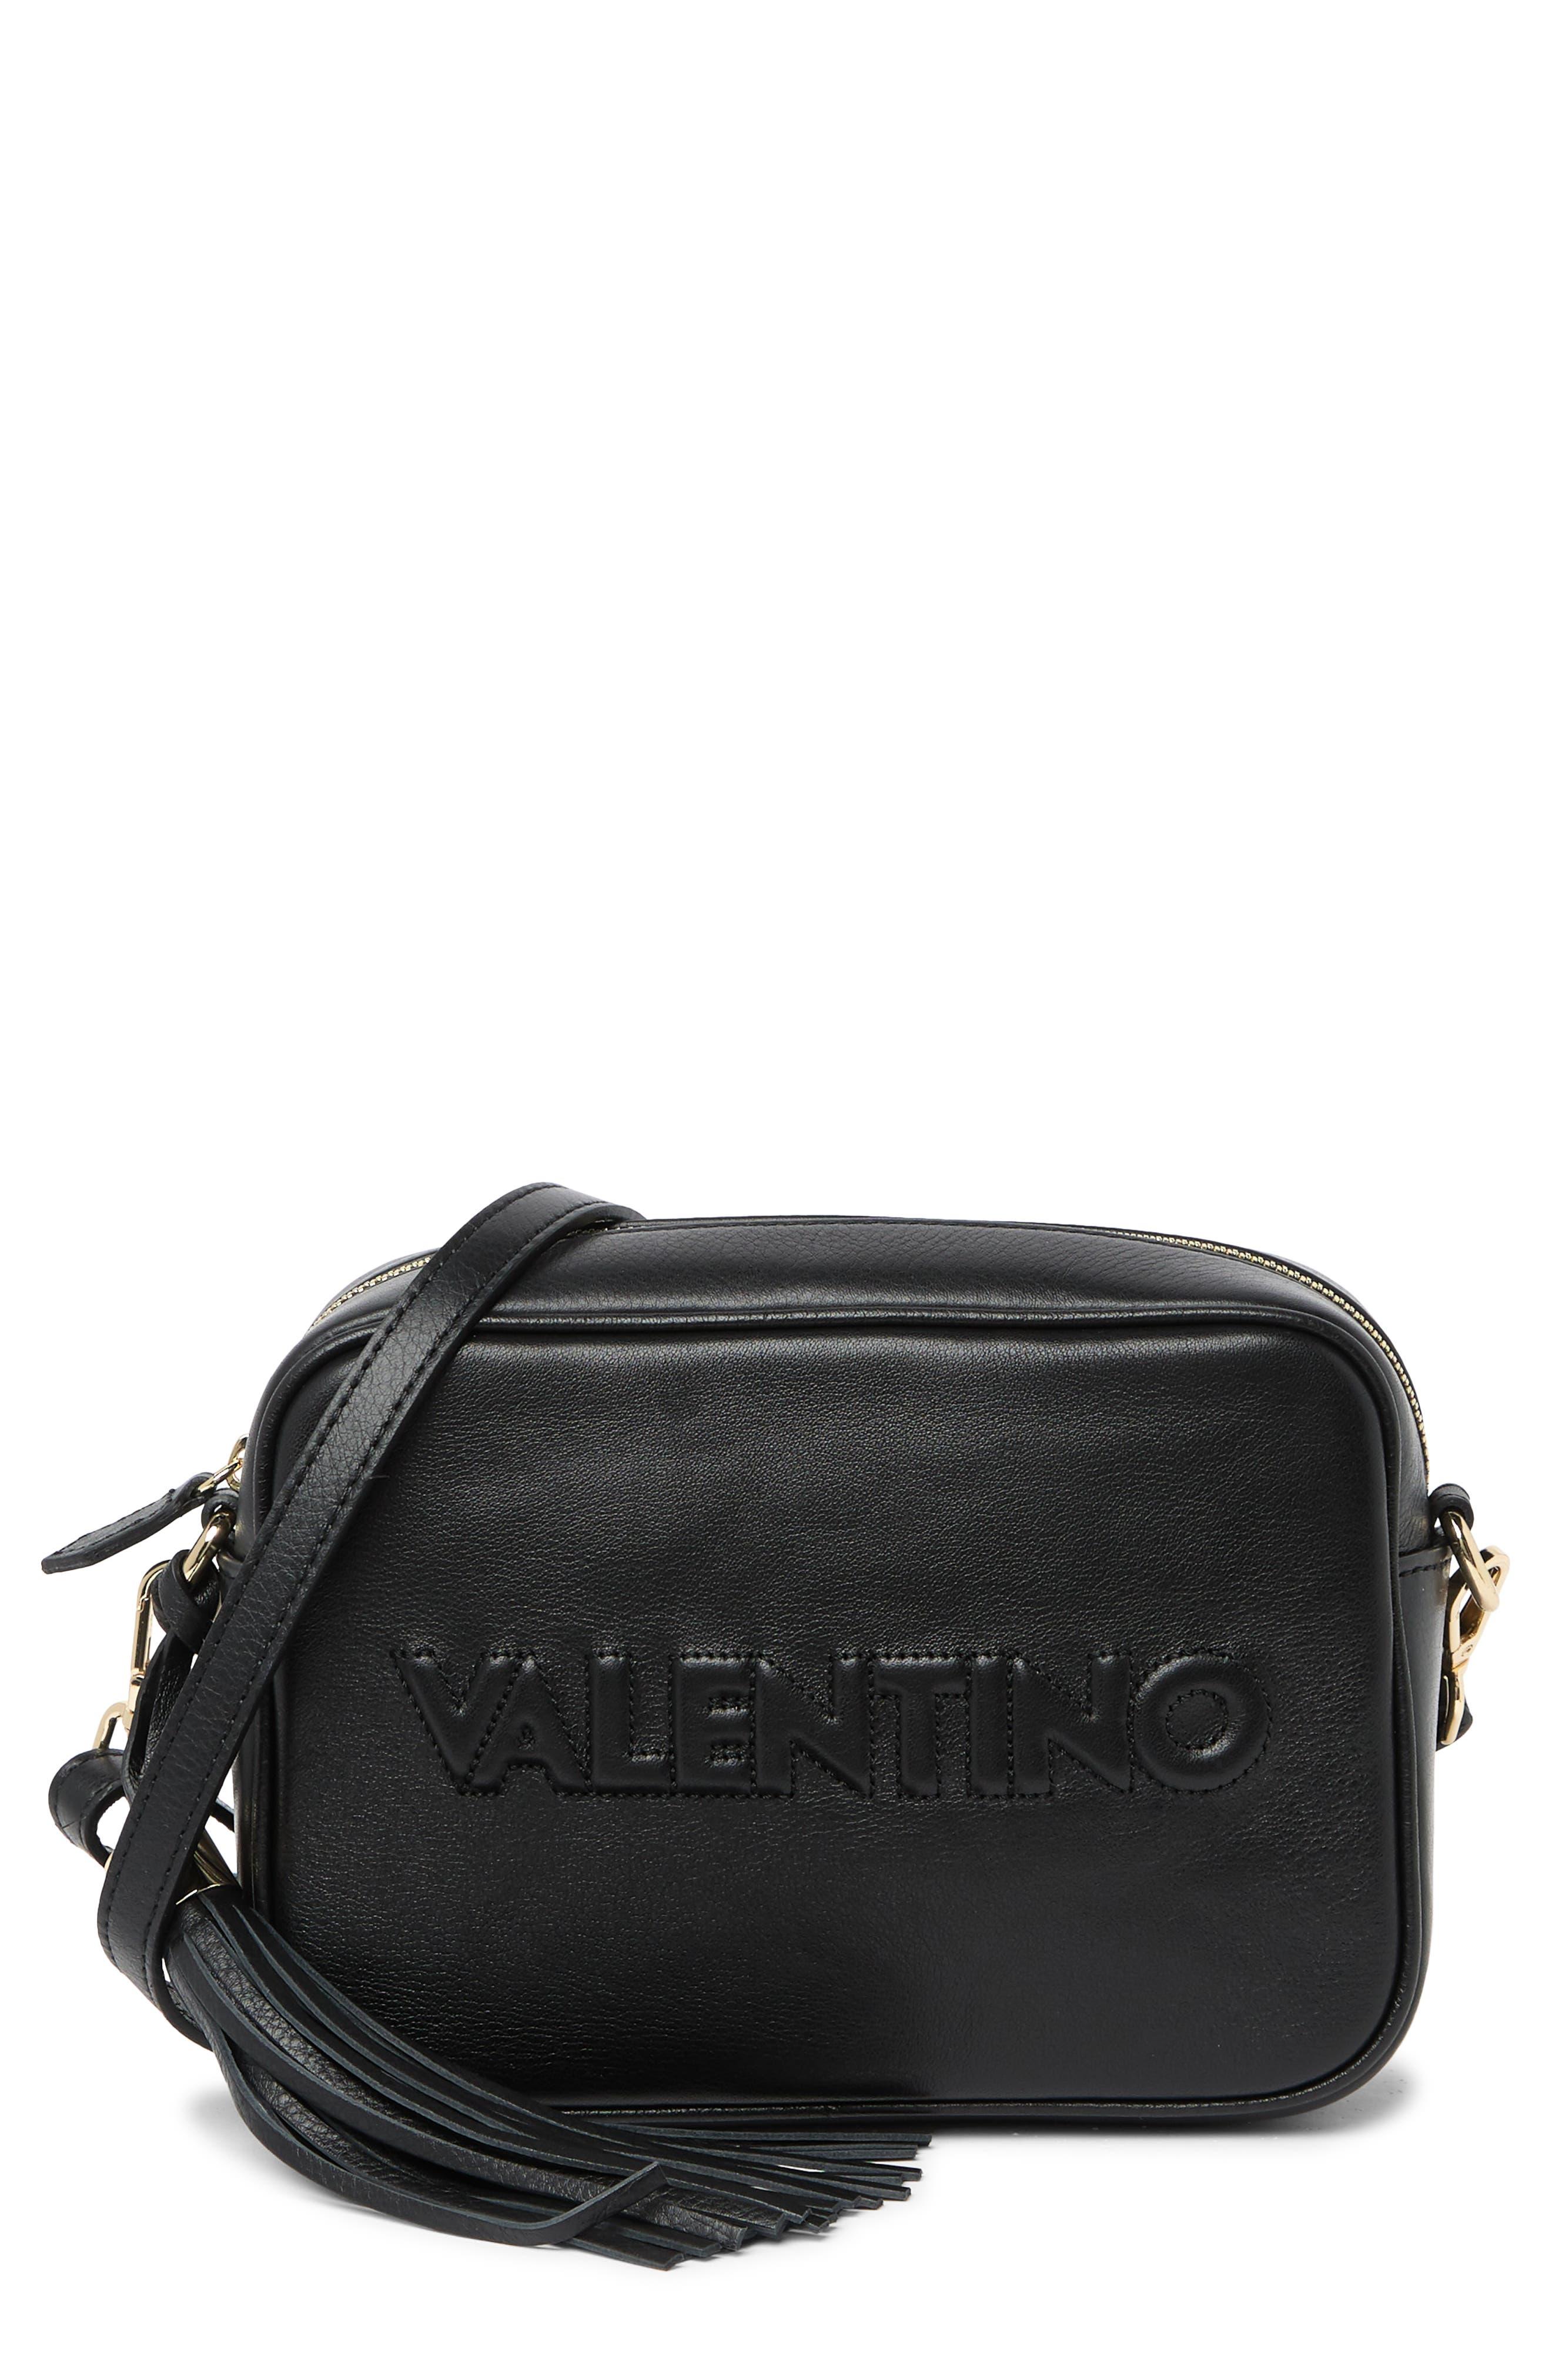 Image of Valentino By Mario Valentino Mia Sauvage Embossed Leather Crossbody Bag